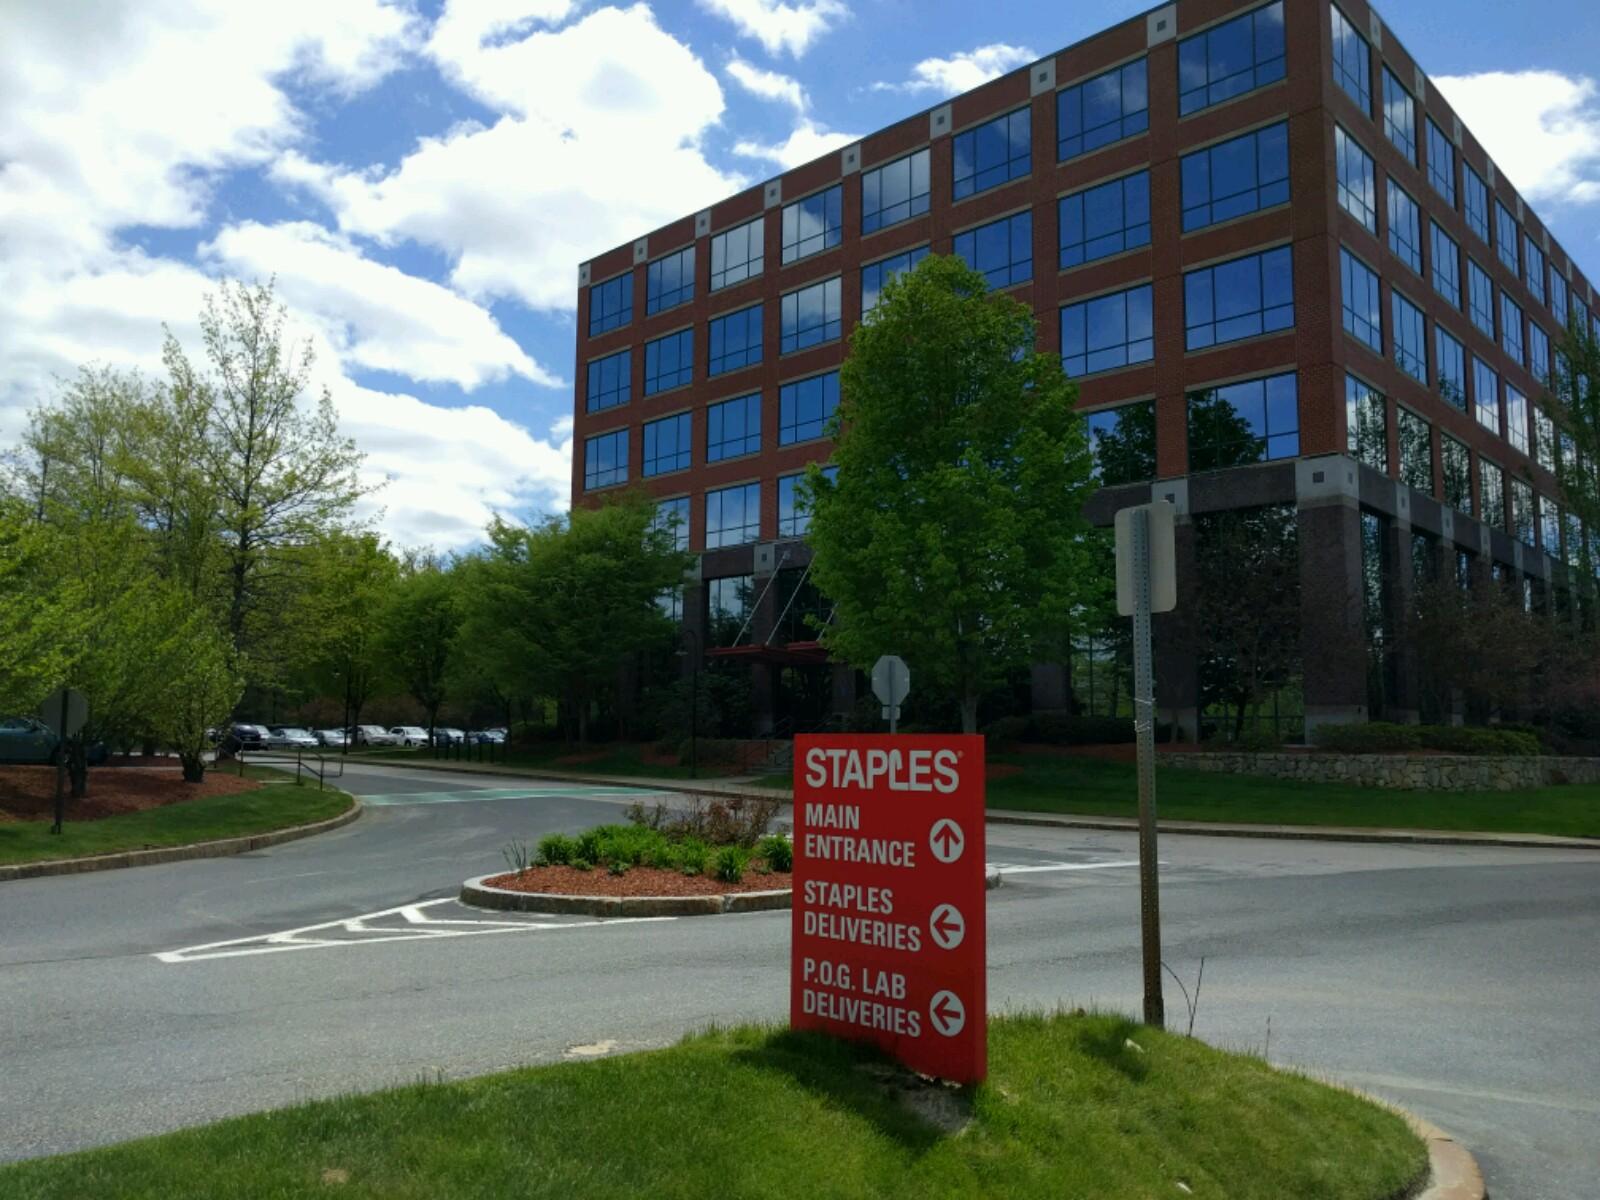 Entrance to Staples' corporate headquarters in Framingham, Massachusetts.